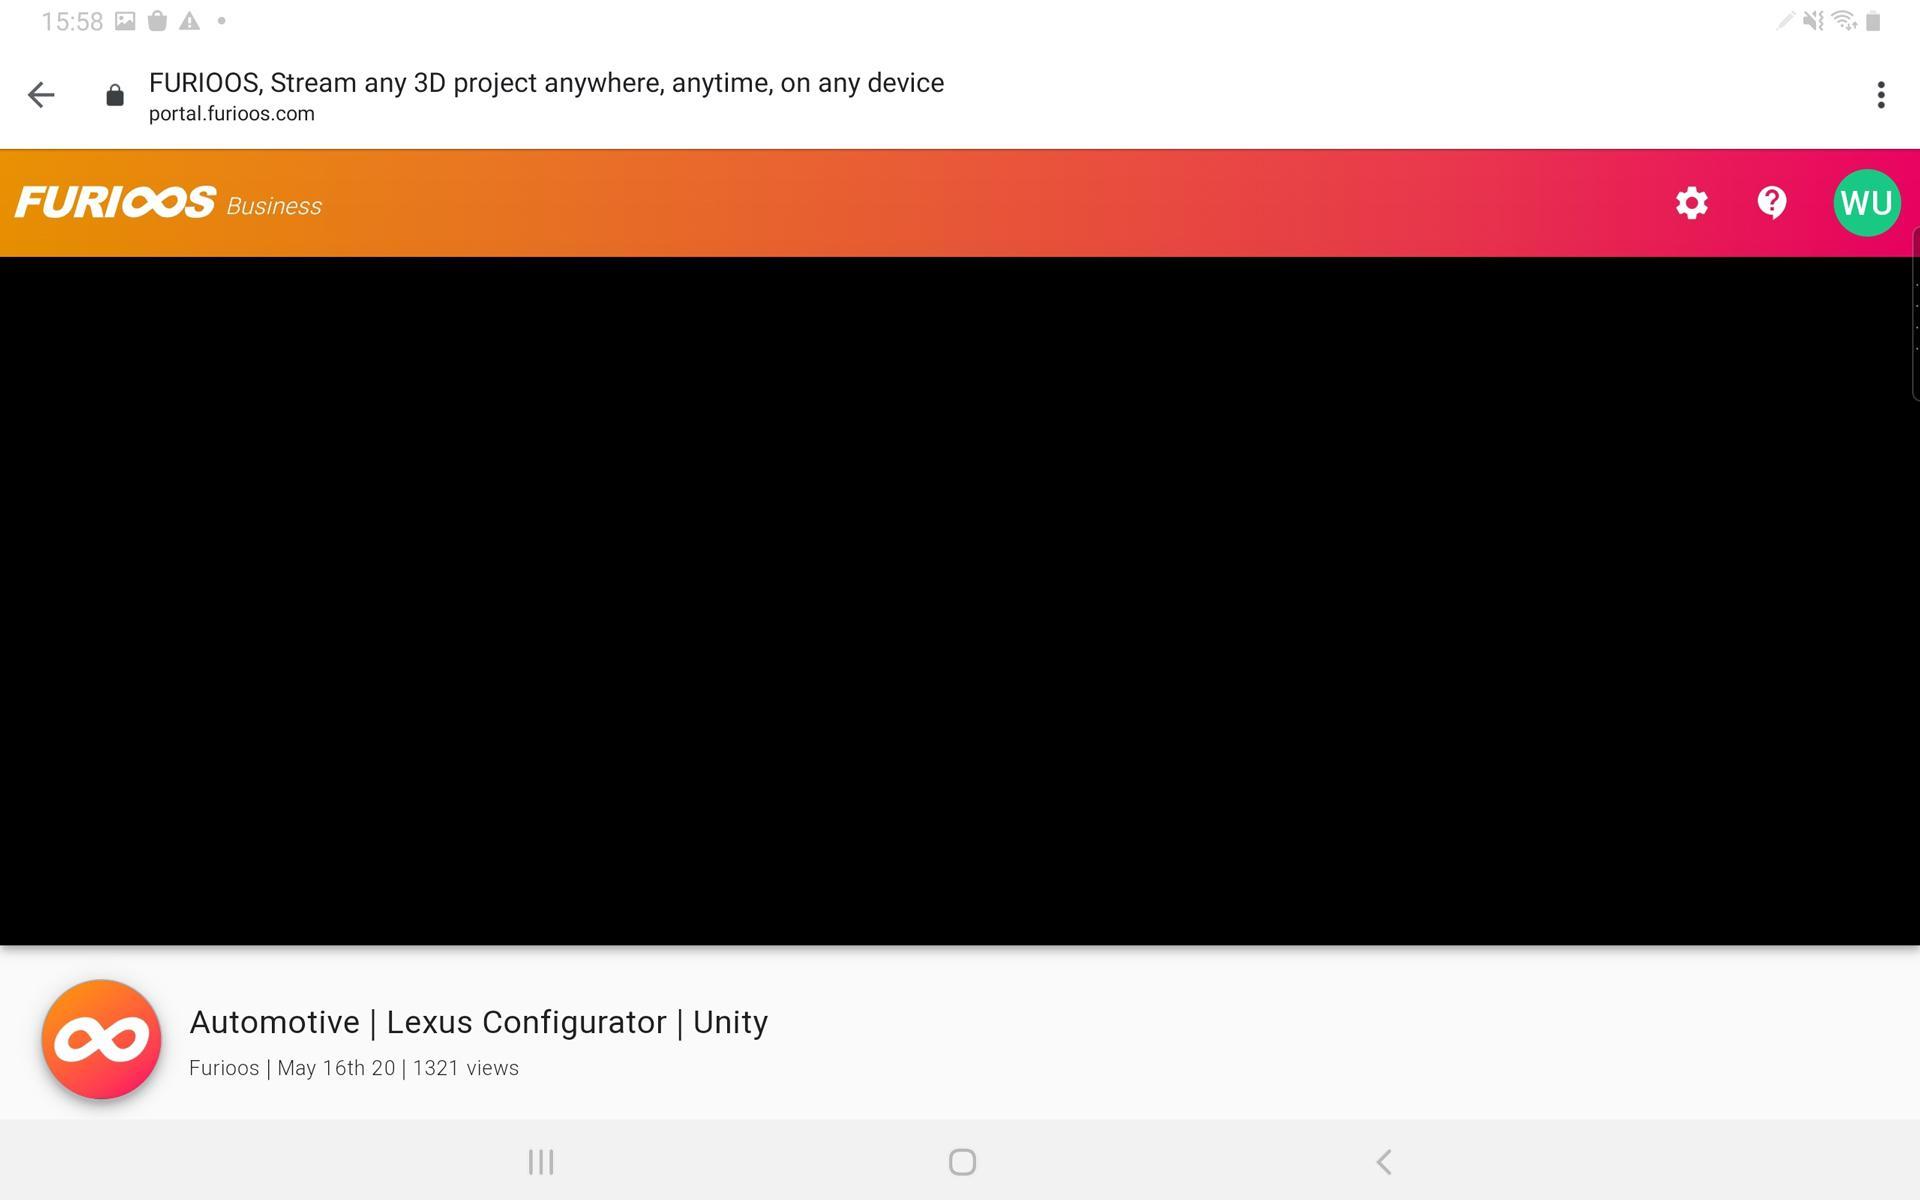 mobile black screen - Automotive | Lexus Configurator | Unity